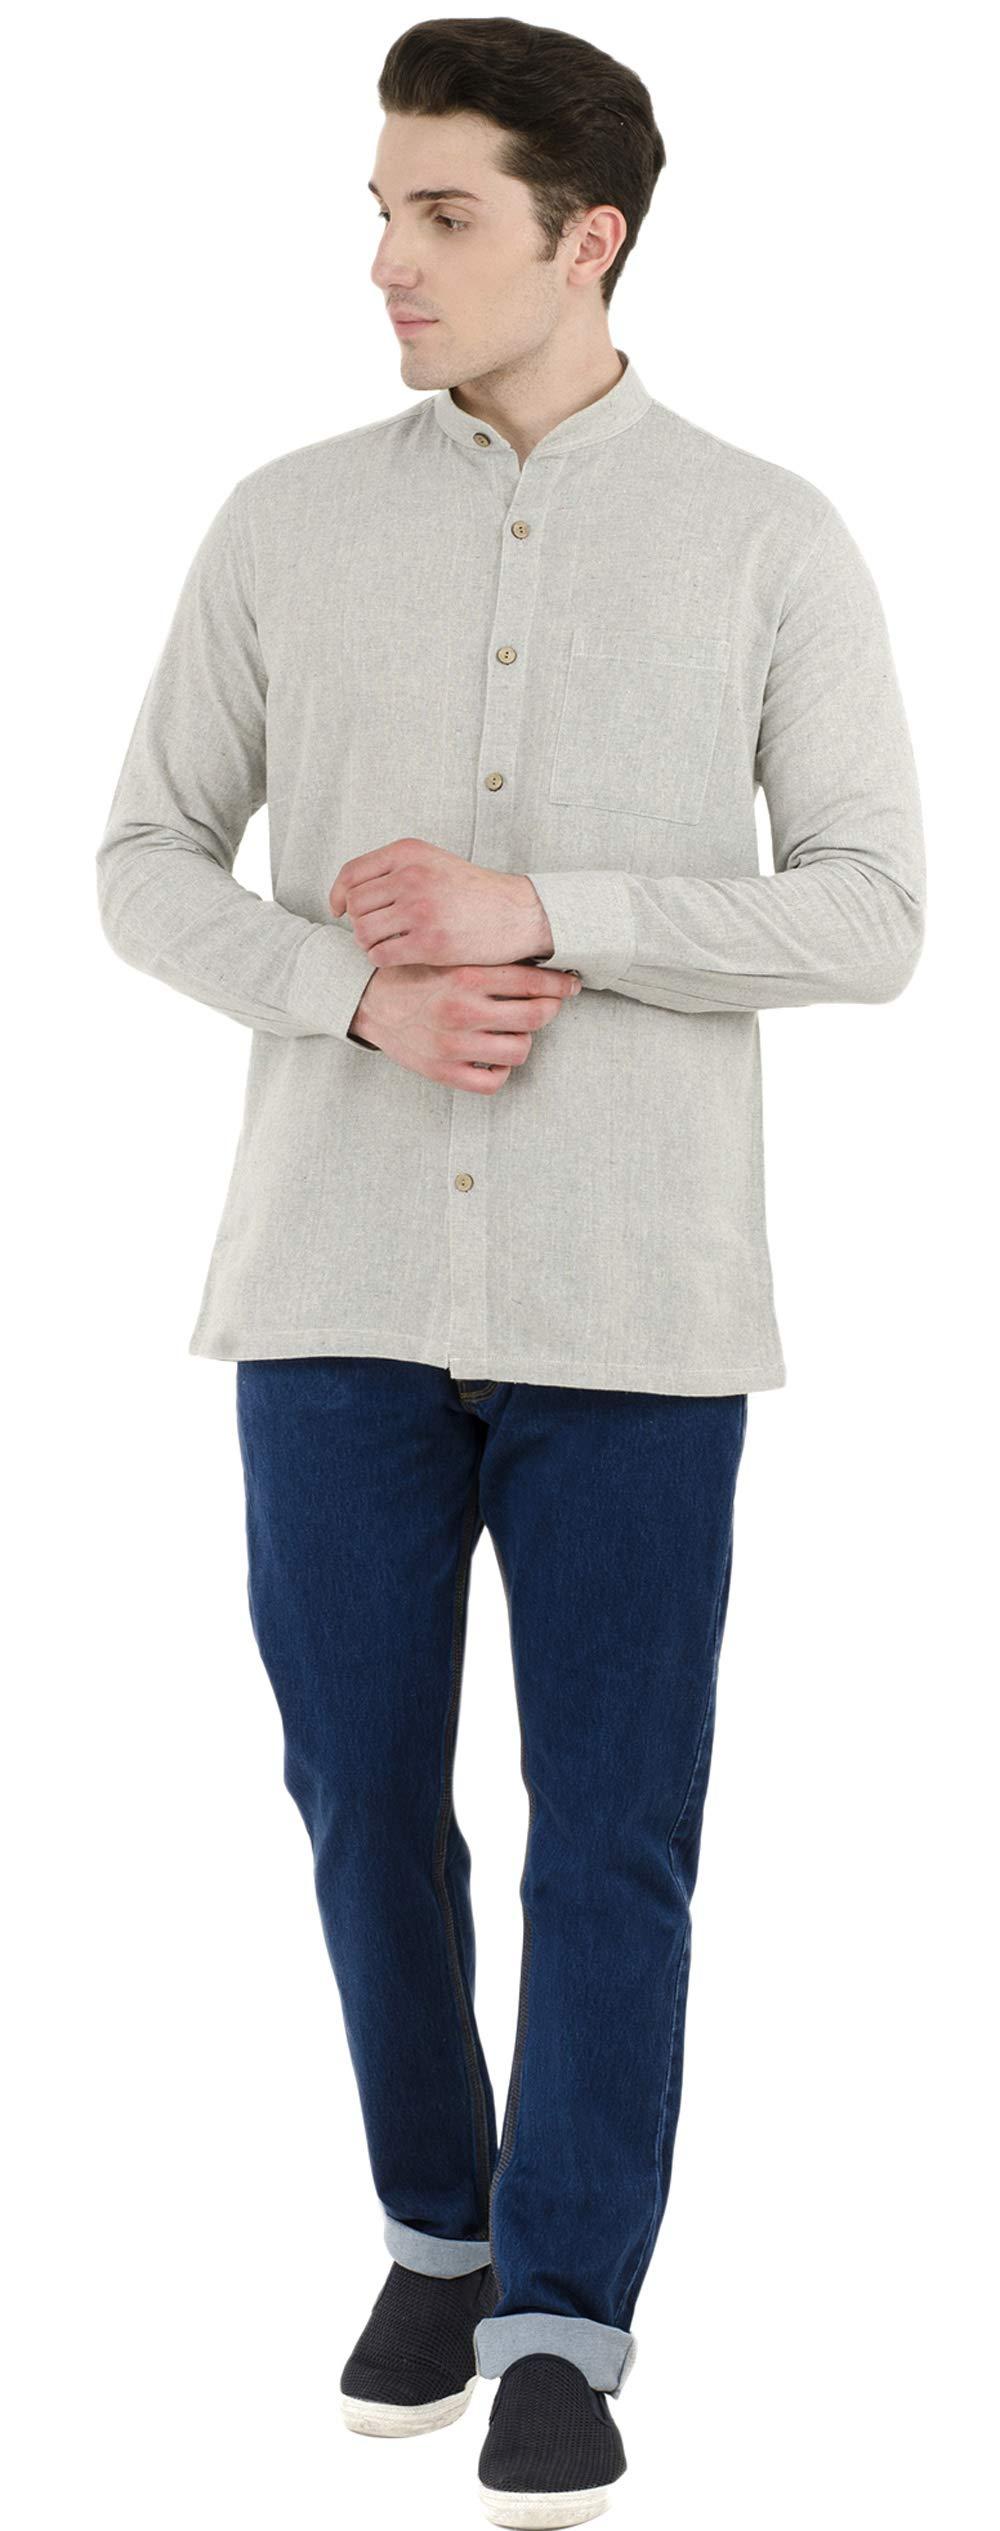 SKAVIJ Button Down Shirts for Men Cotton Long Sleeve Casual Shirts Regular Fit Grey by SKAVIJ (Image #7)